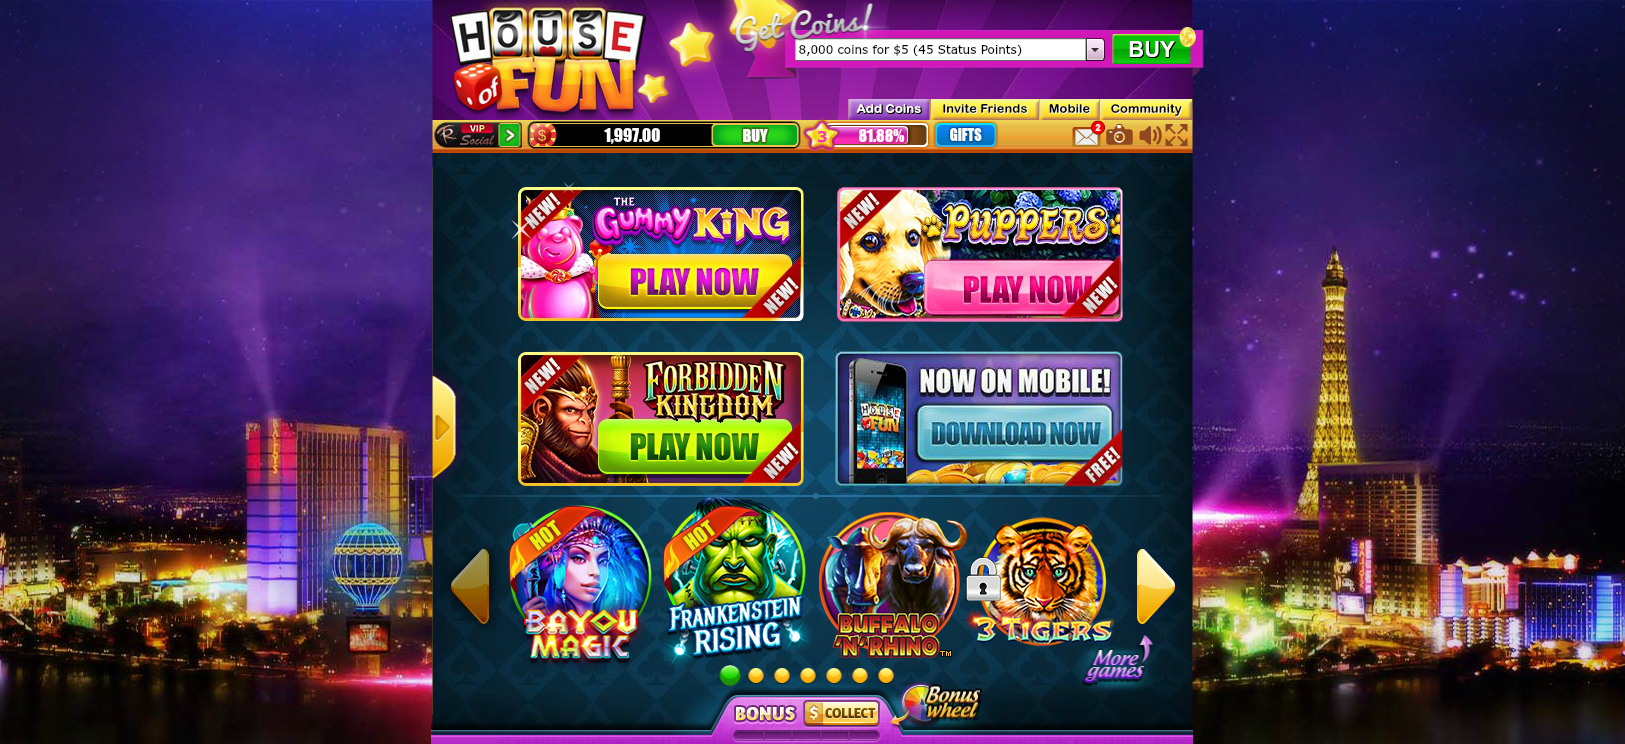 fun casino games at home